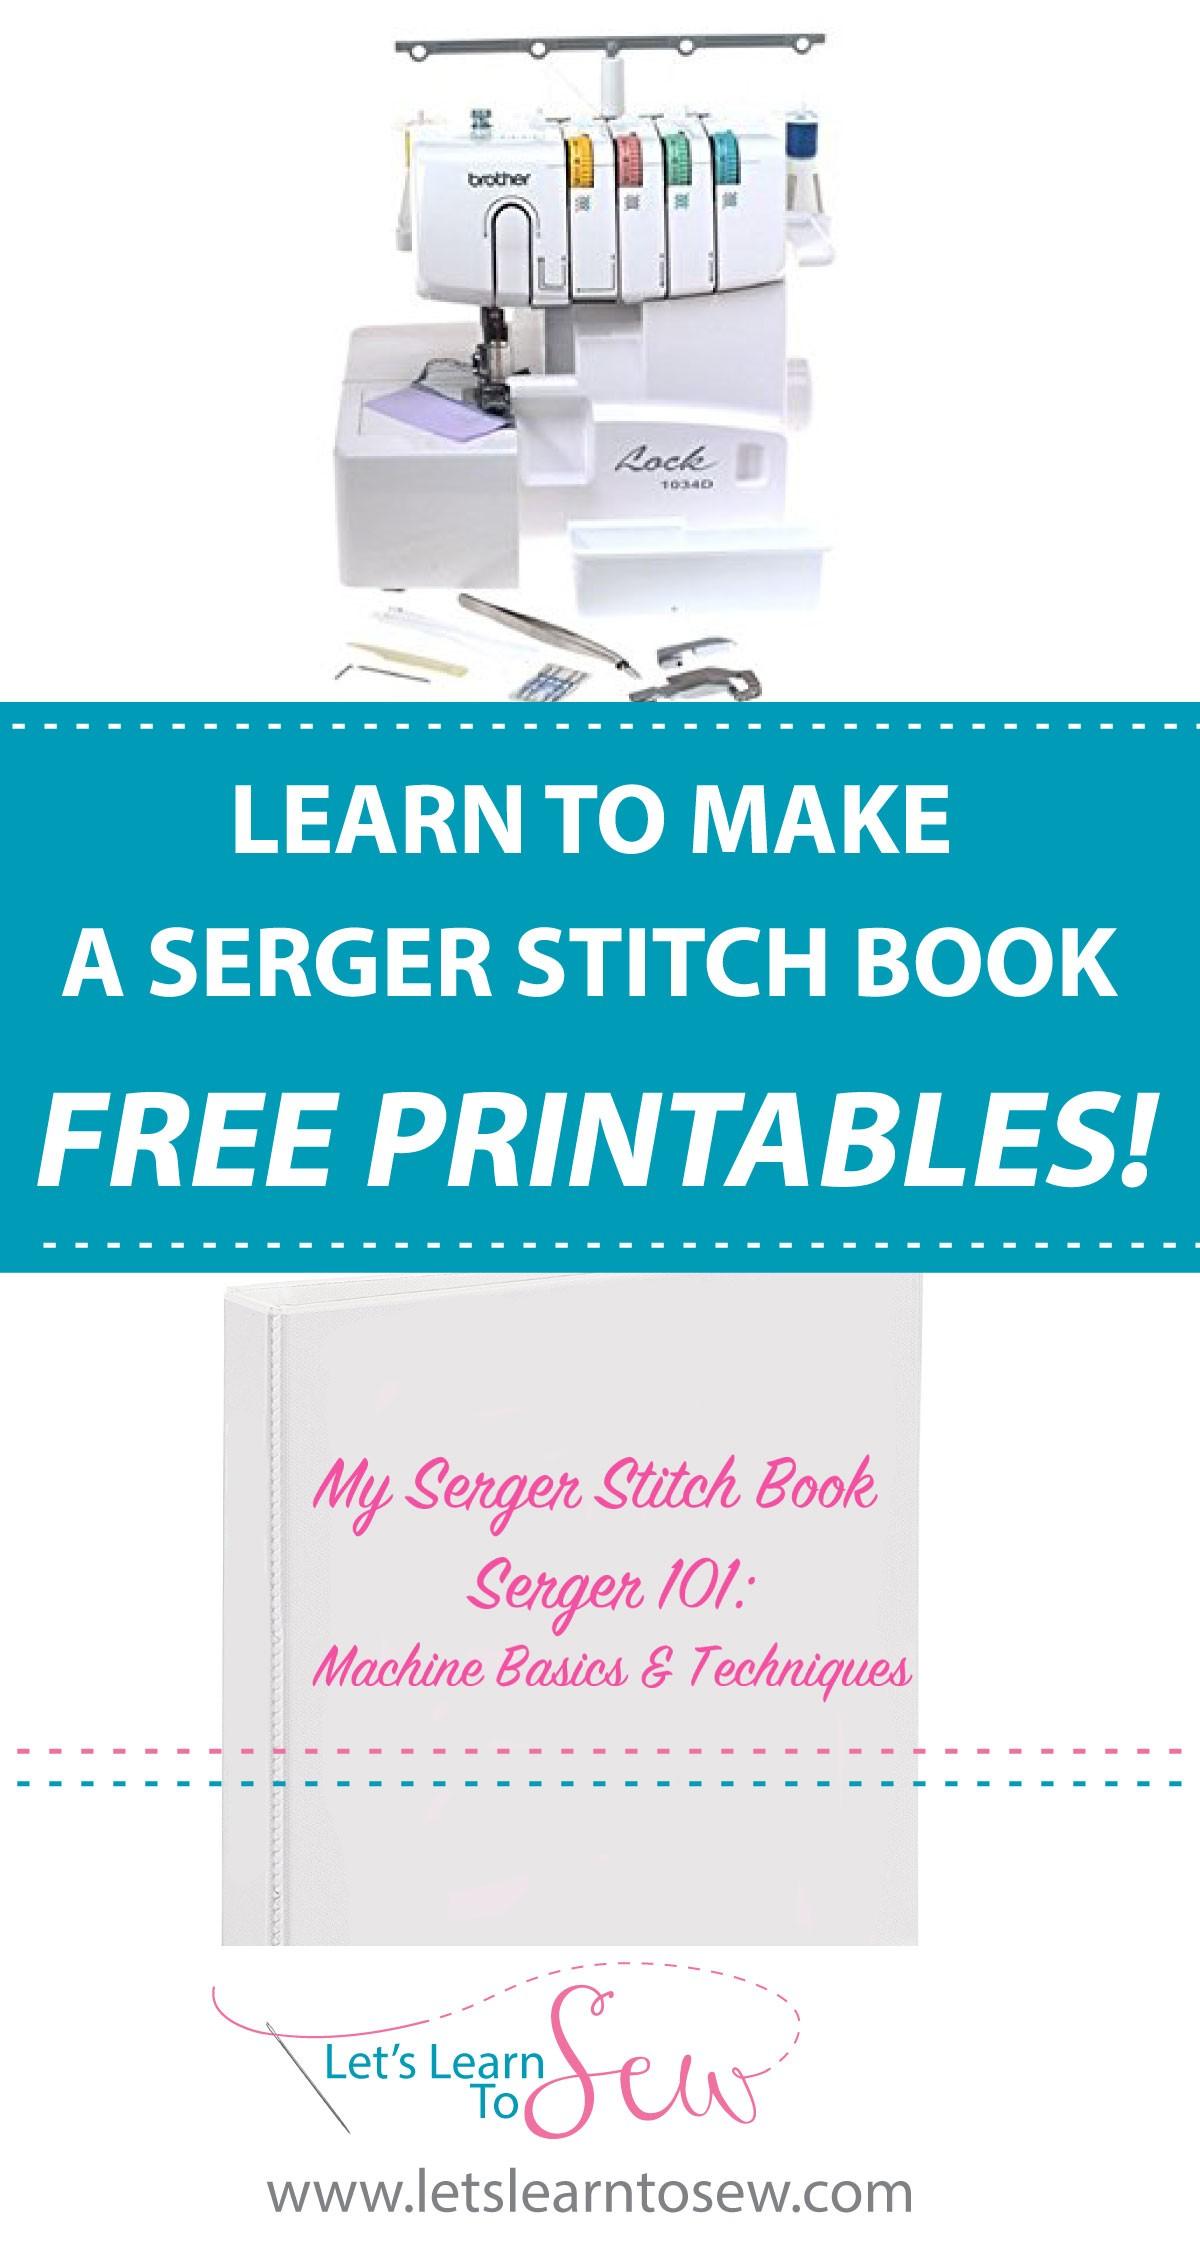 How To Make A Serger Stitch Book Including free printables